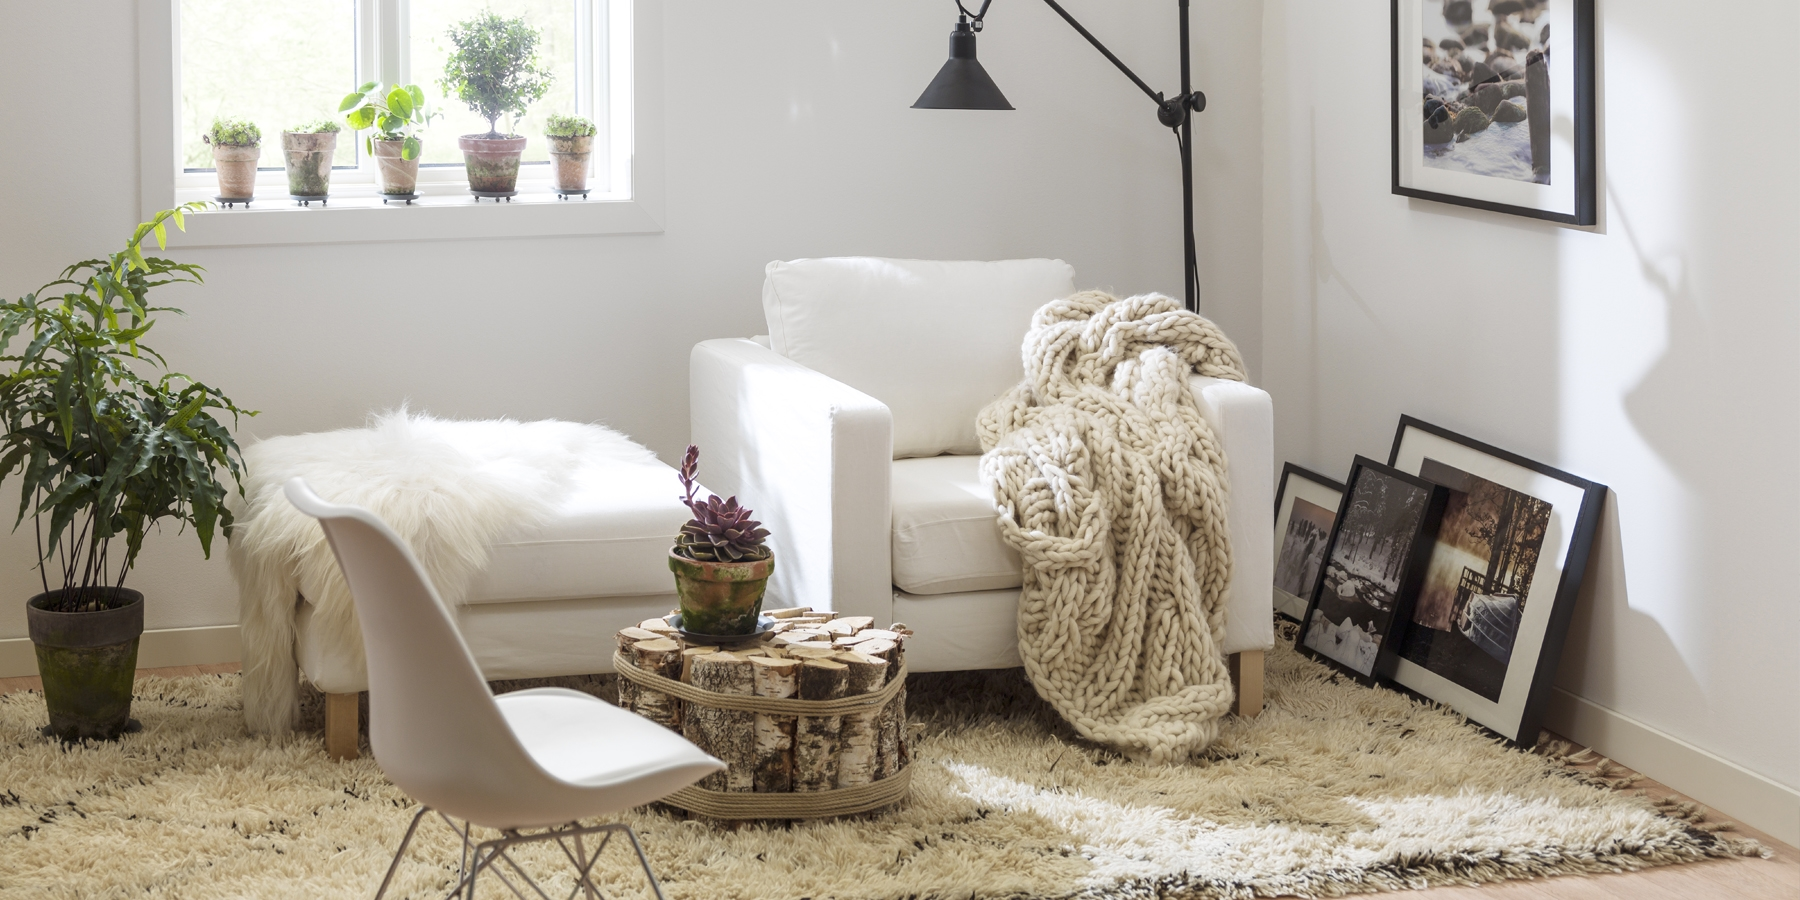 Rum med normalt slitage text sovrum & vardagsrum